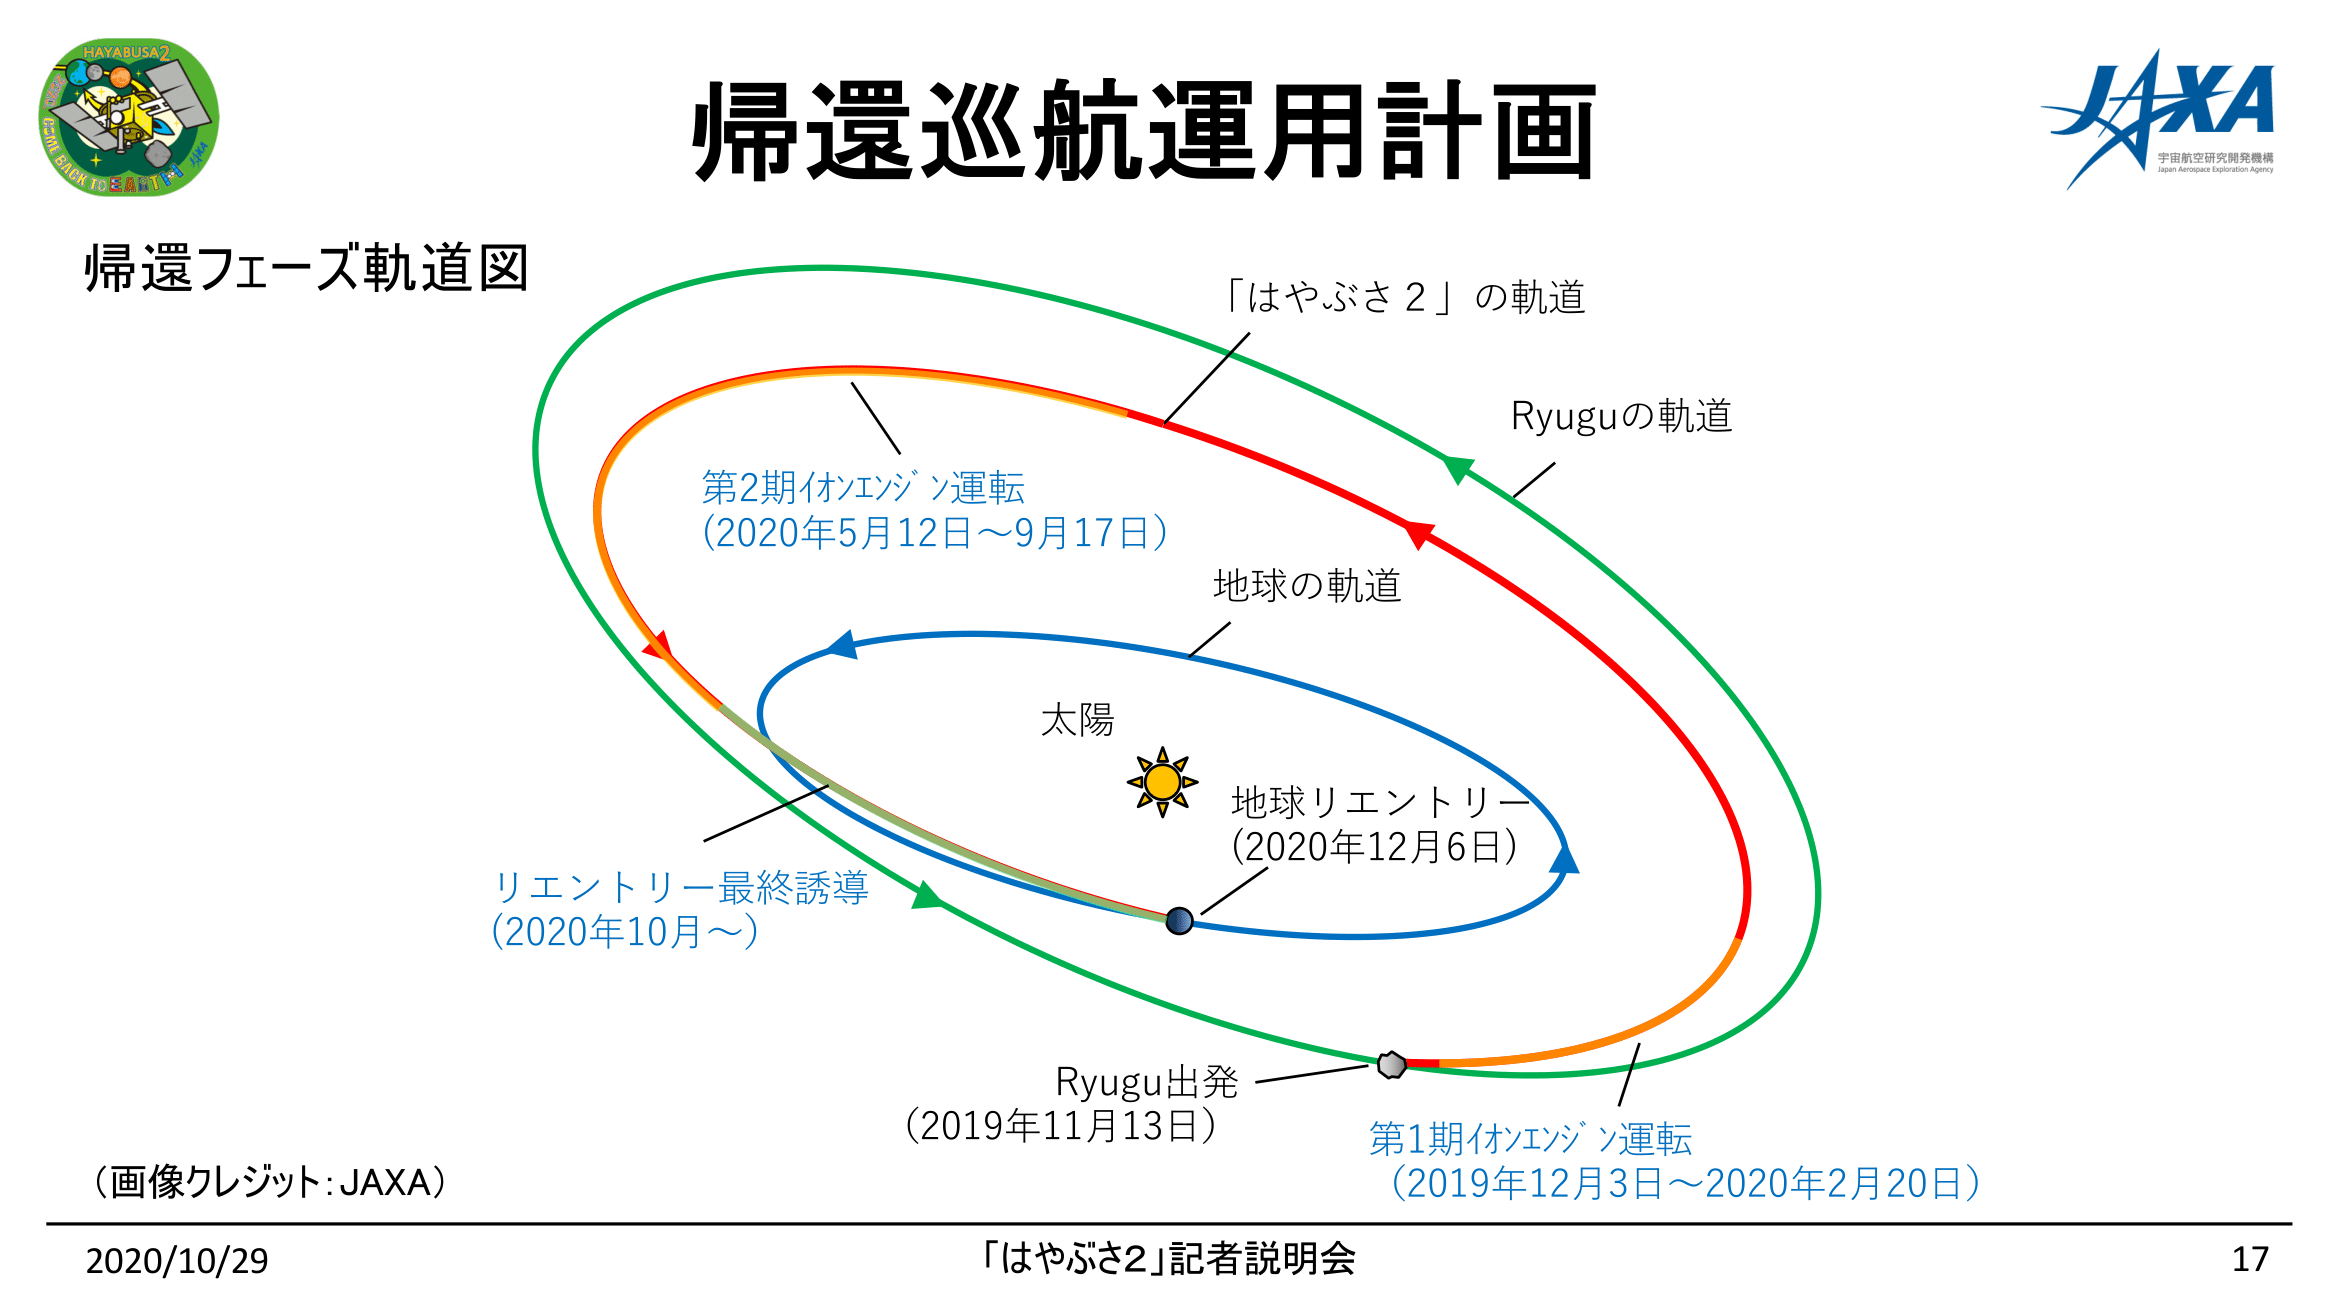 f:id:Imamura:20201029161427p:plain